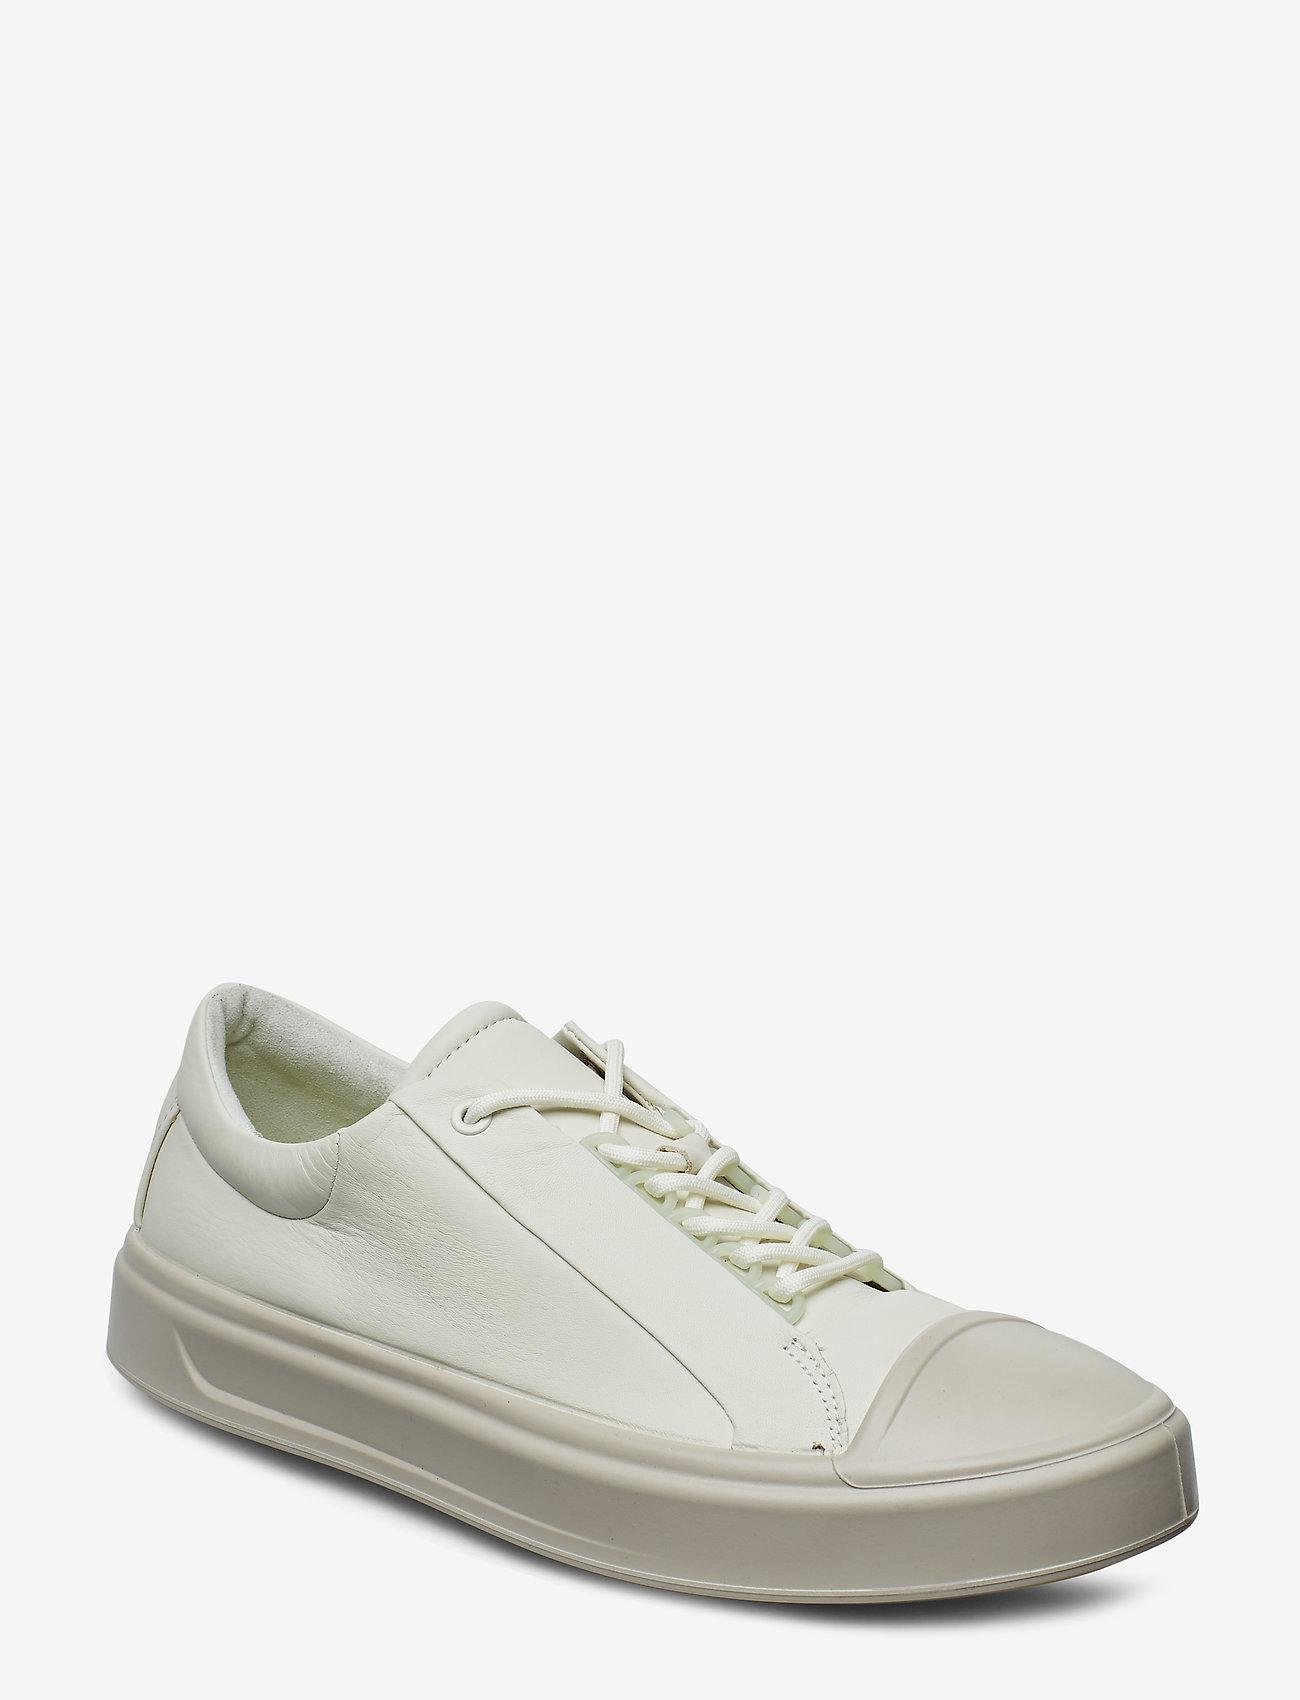 Flexure T-cap M (Shadow White) (£78